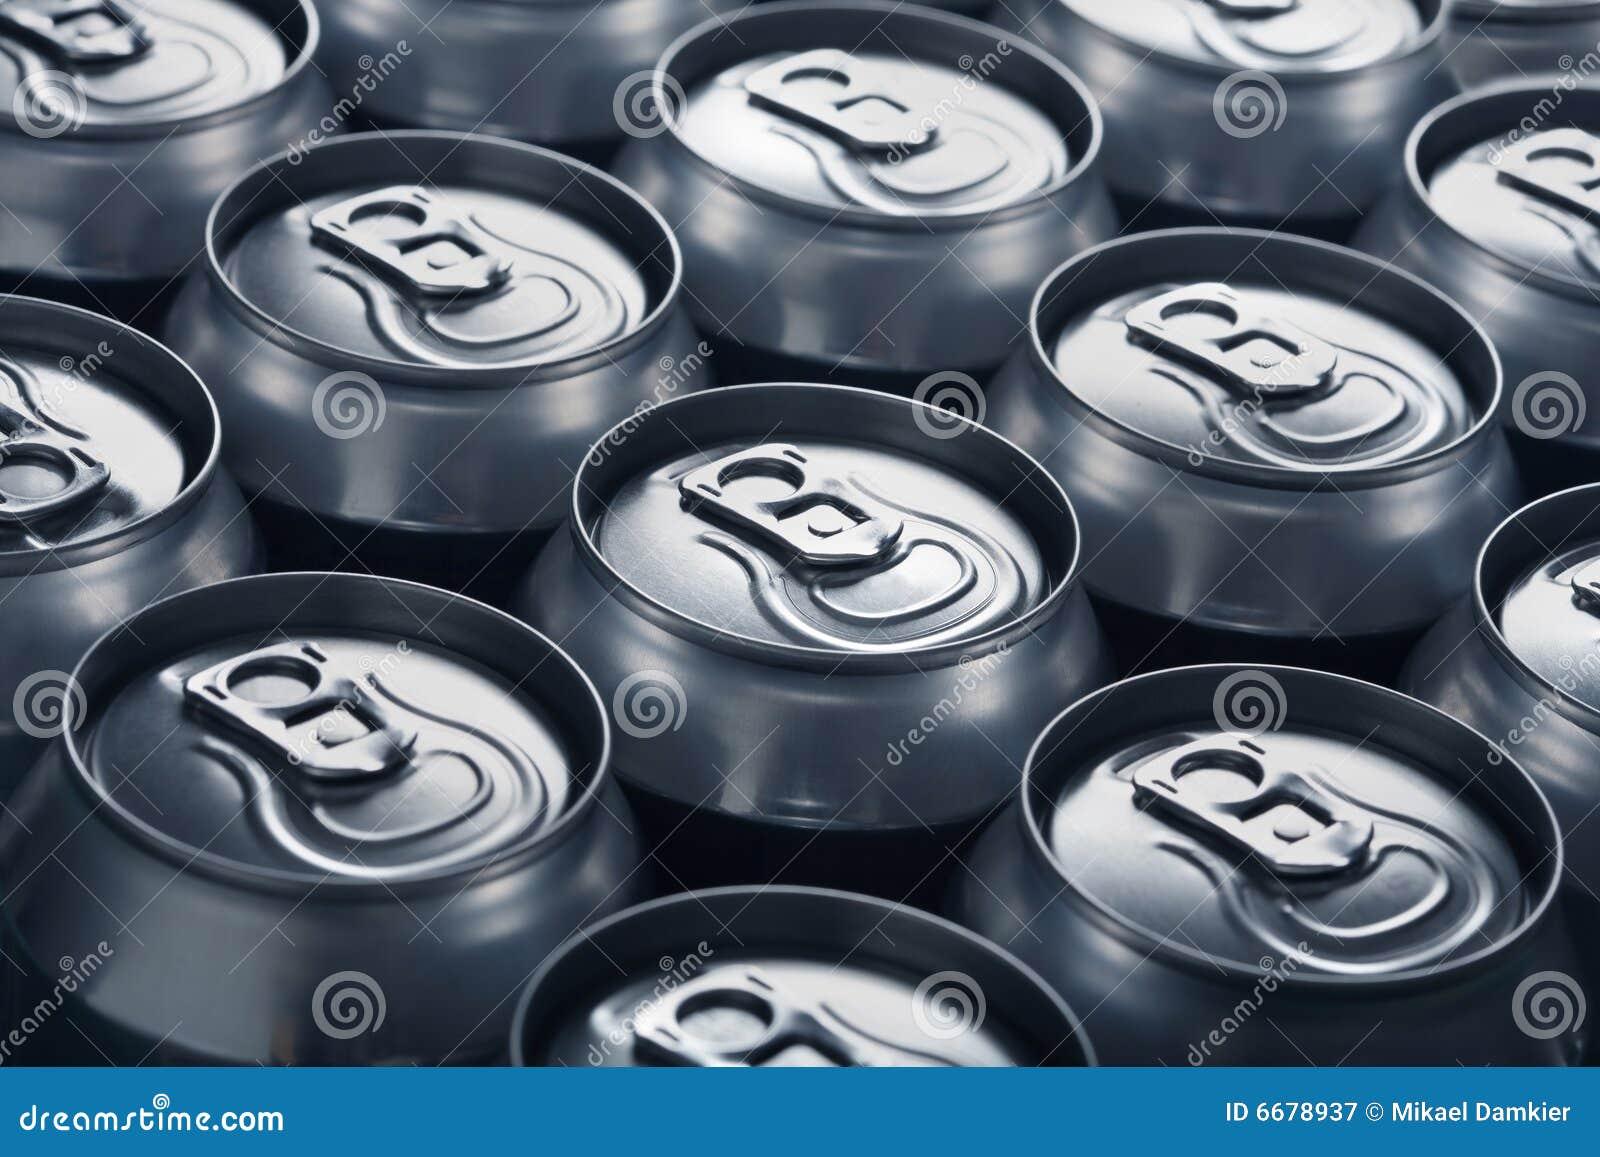 aluminiumdosen stockbild bild von alcohol bier abschlu 6678937. Black Bedroom Furniture Sets. Home Design Ideas